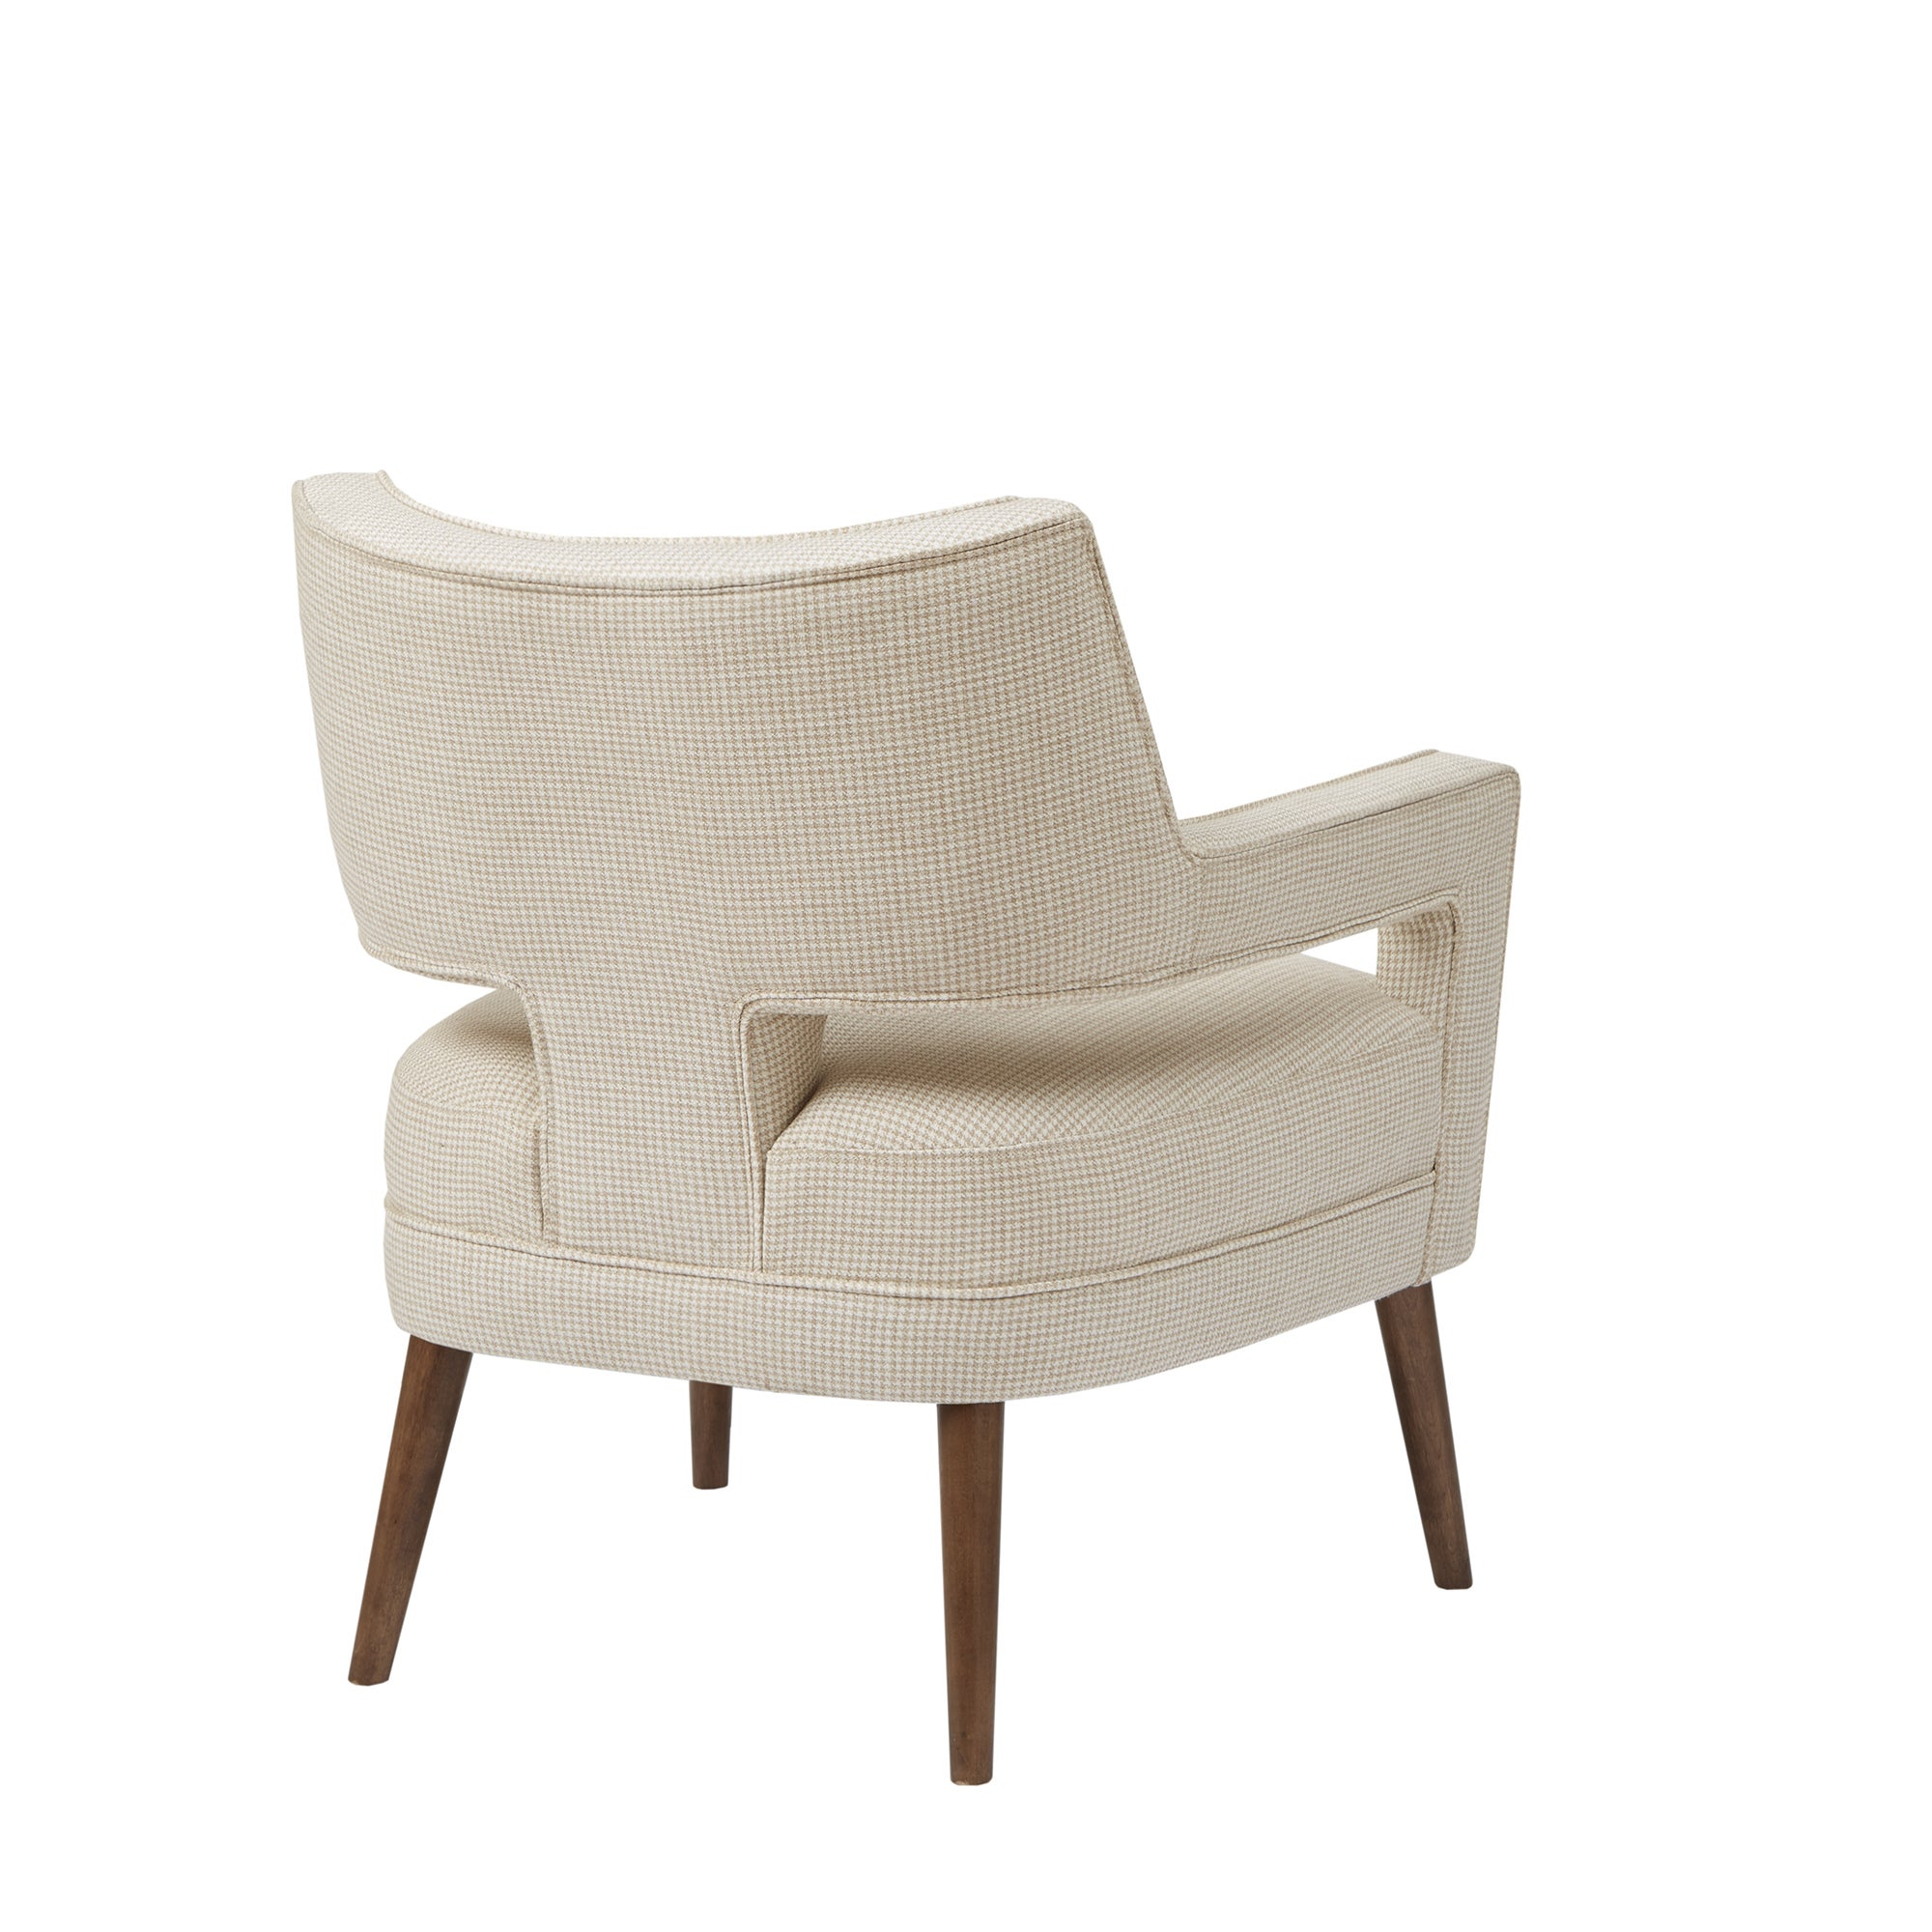 Incredible Madison Park Nicoli Cream Accent Chair Dailytribune Chair Design For Home Dailytribuneorg